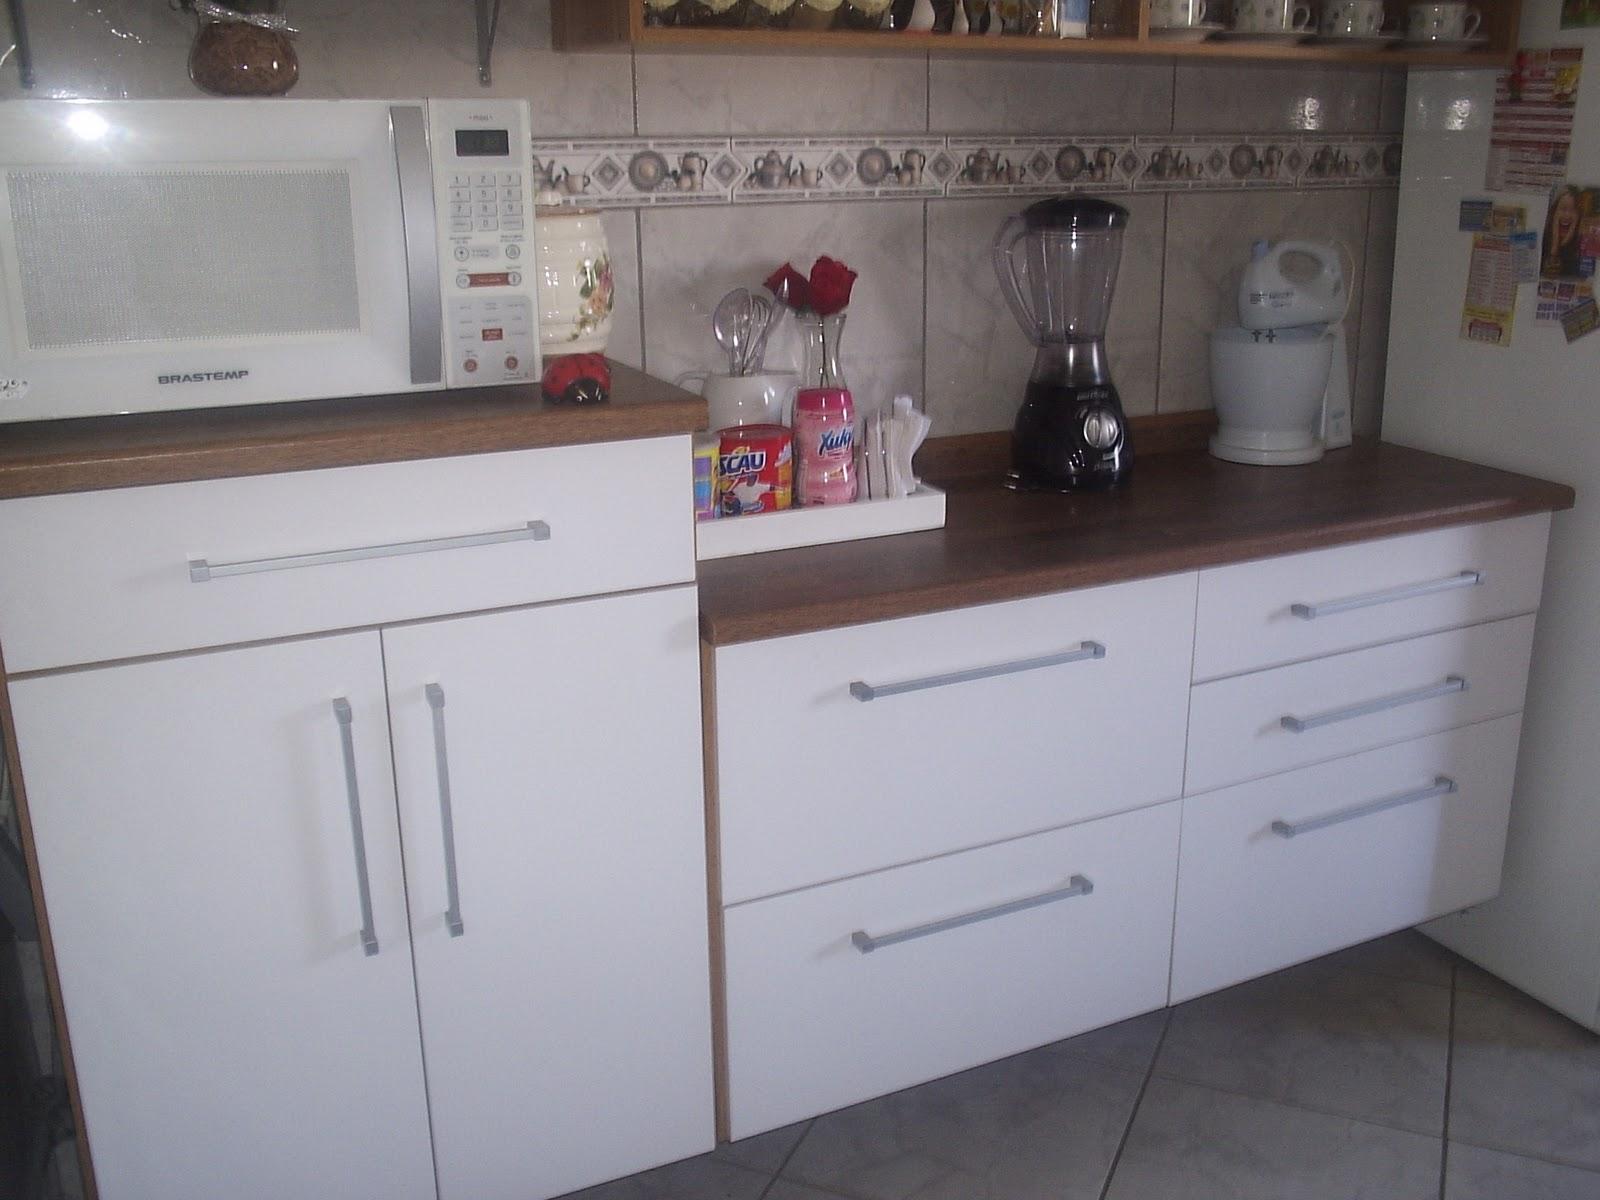 kits para cozinha 03 300x184 kit para cozinha casas bahia Quotes #5F4C47 1600 1200